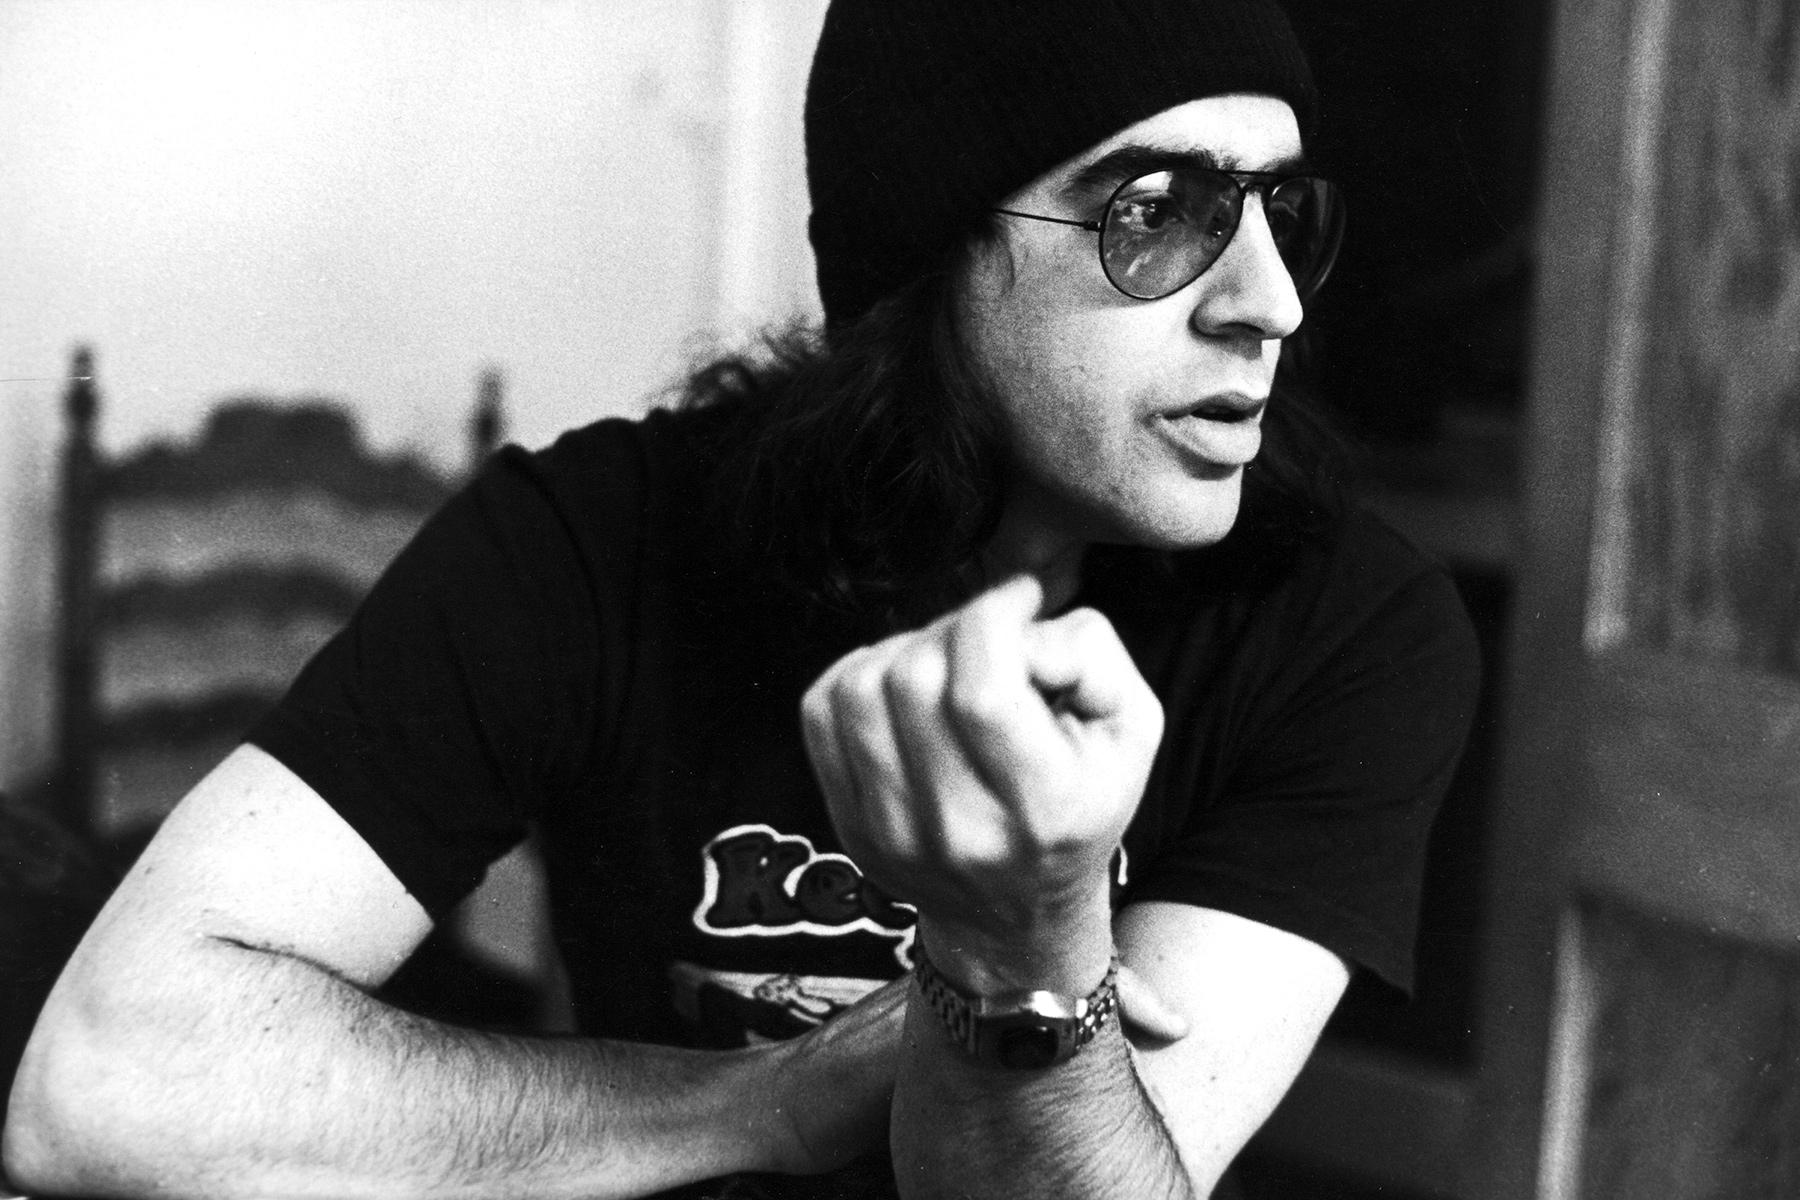 Producer Elliot Mazer, portrait, London, October 1973. (Photo by Michael Putland/Getty Images)